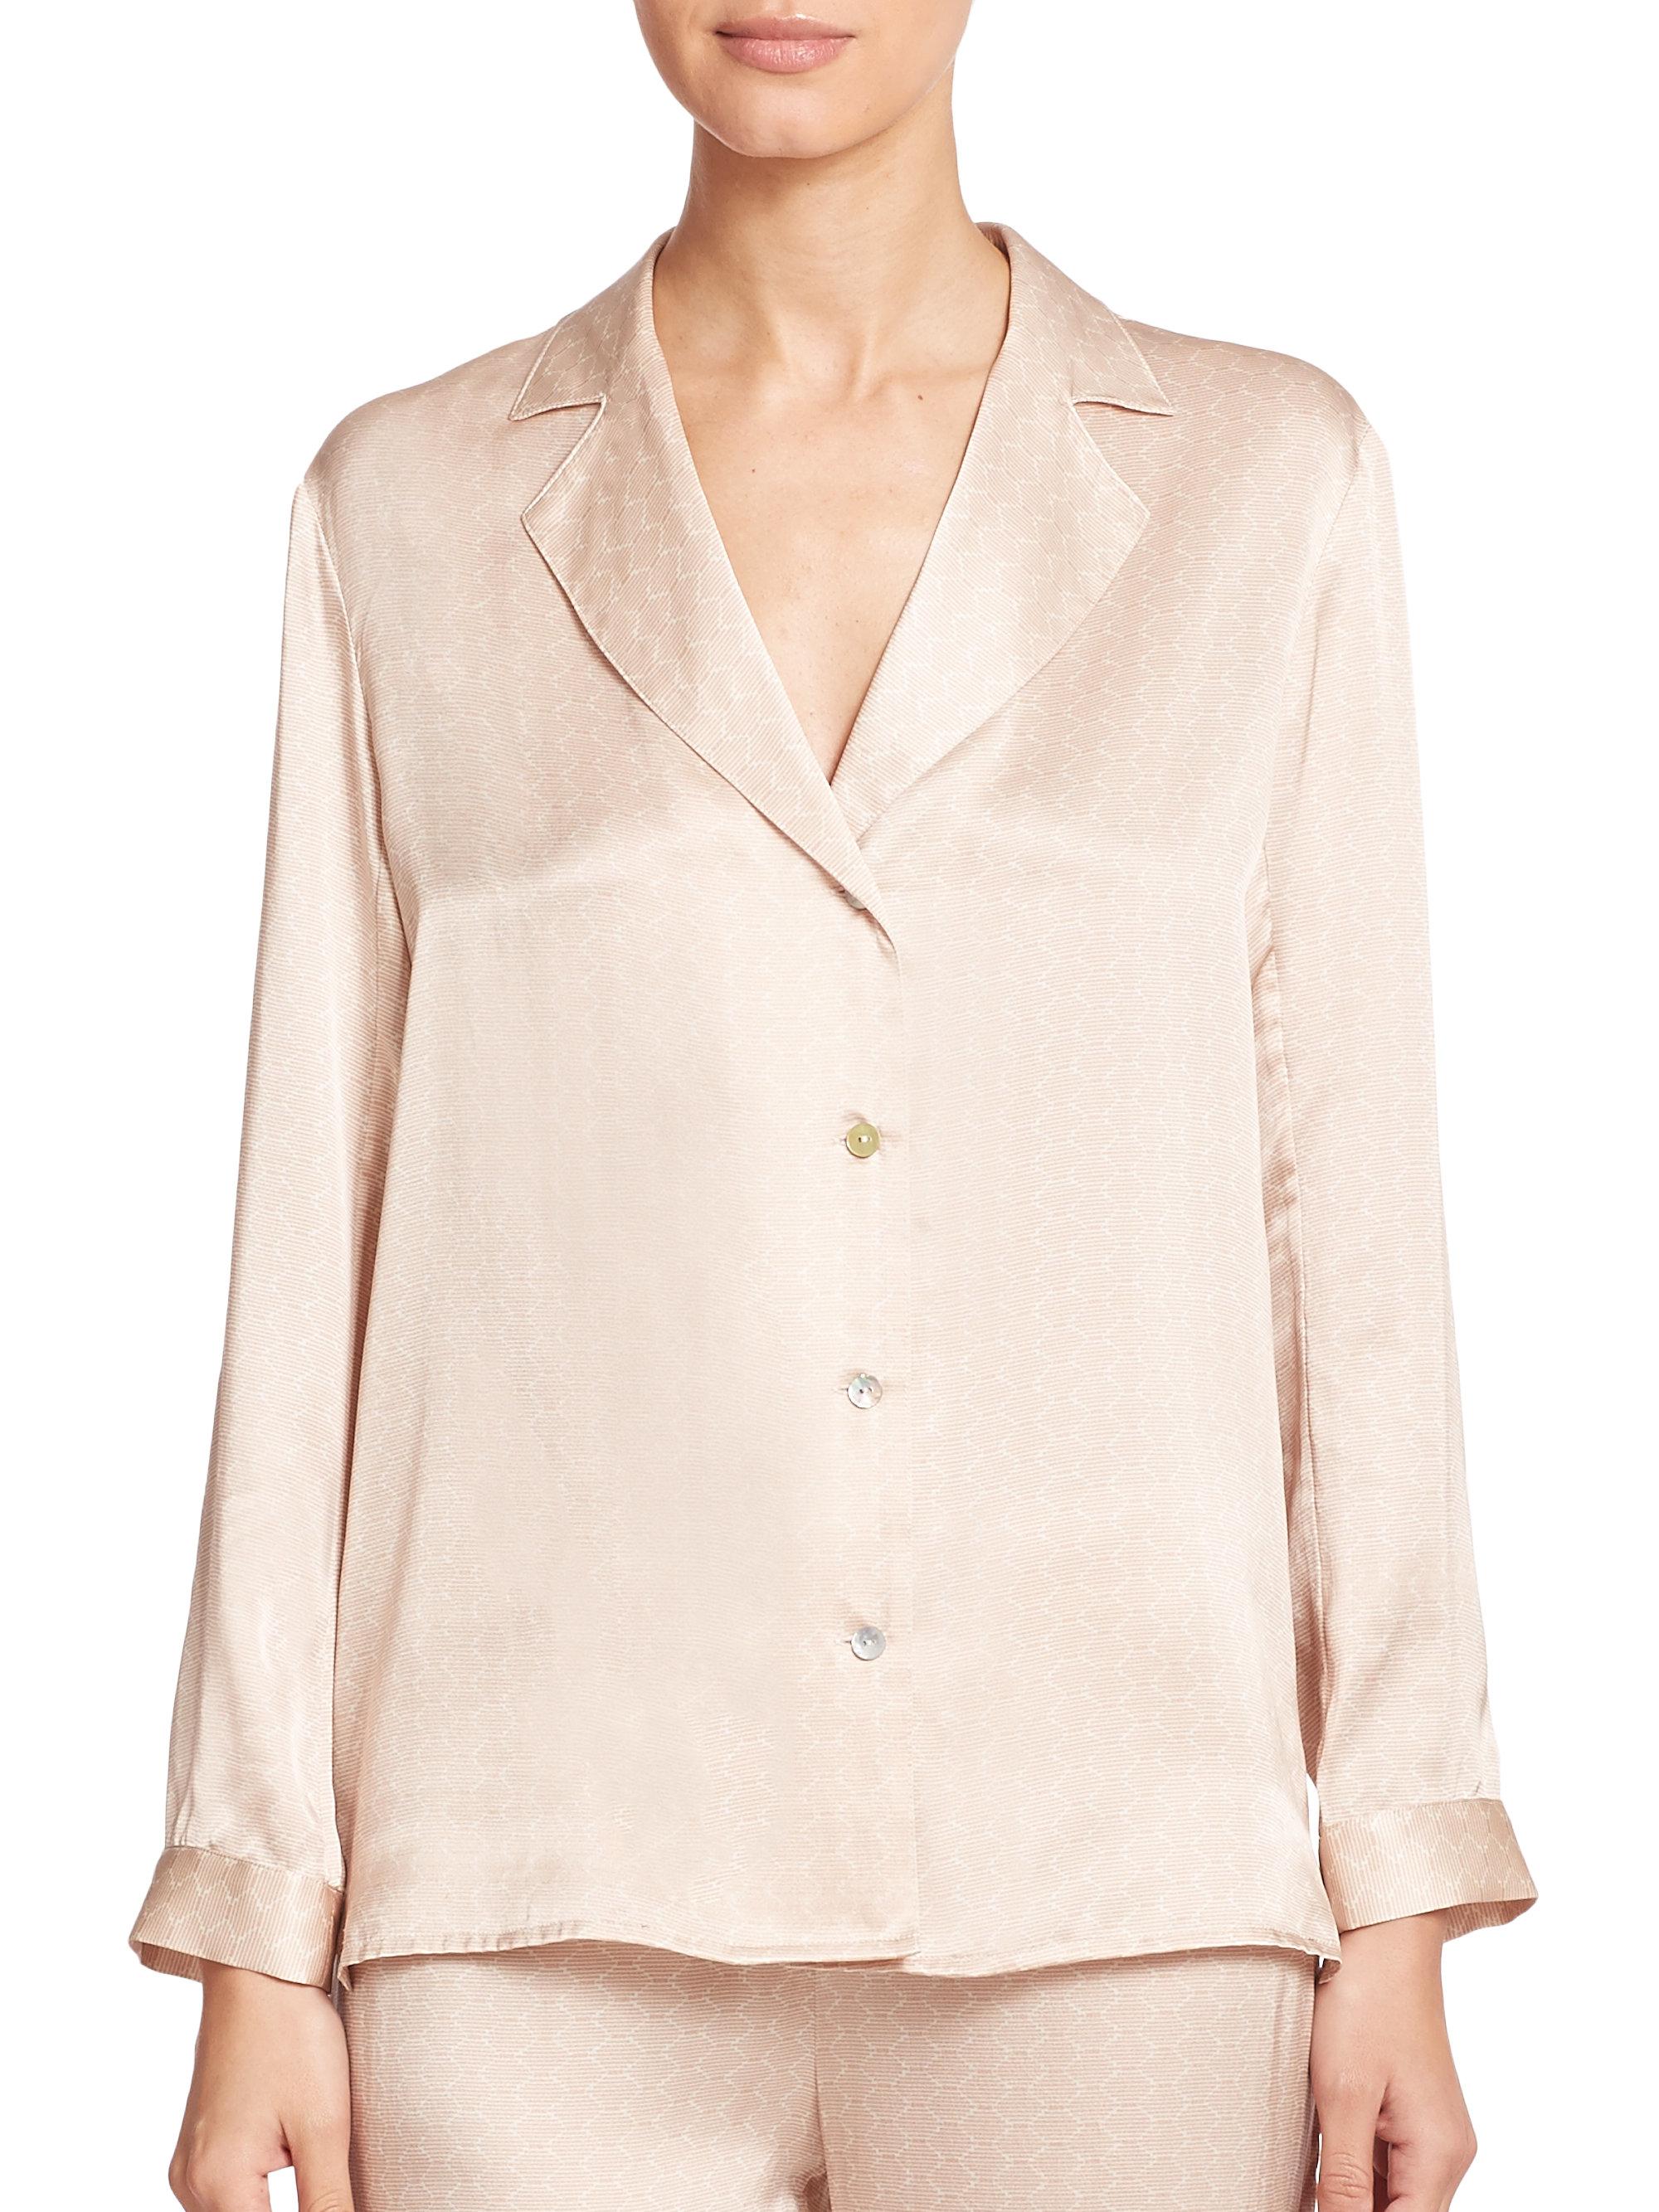 Lyst - Asceno Tile-print Silk Pajama Shirt in Natural 307d12836